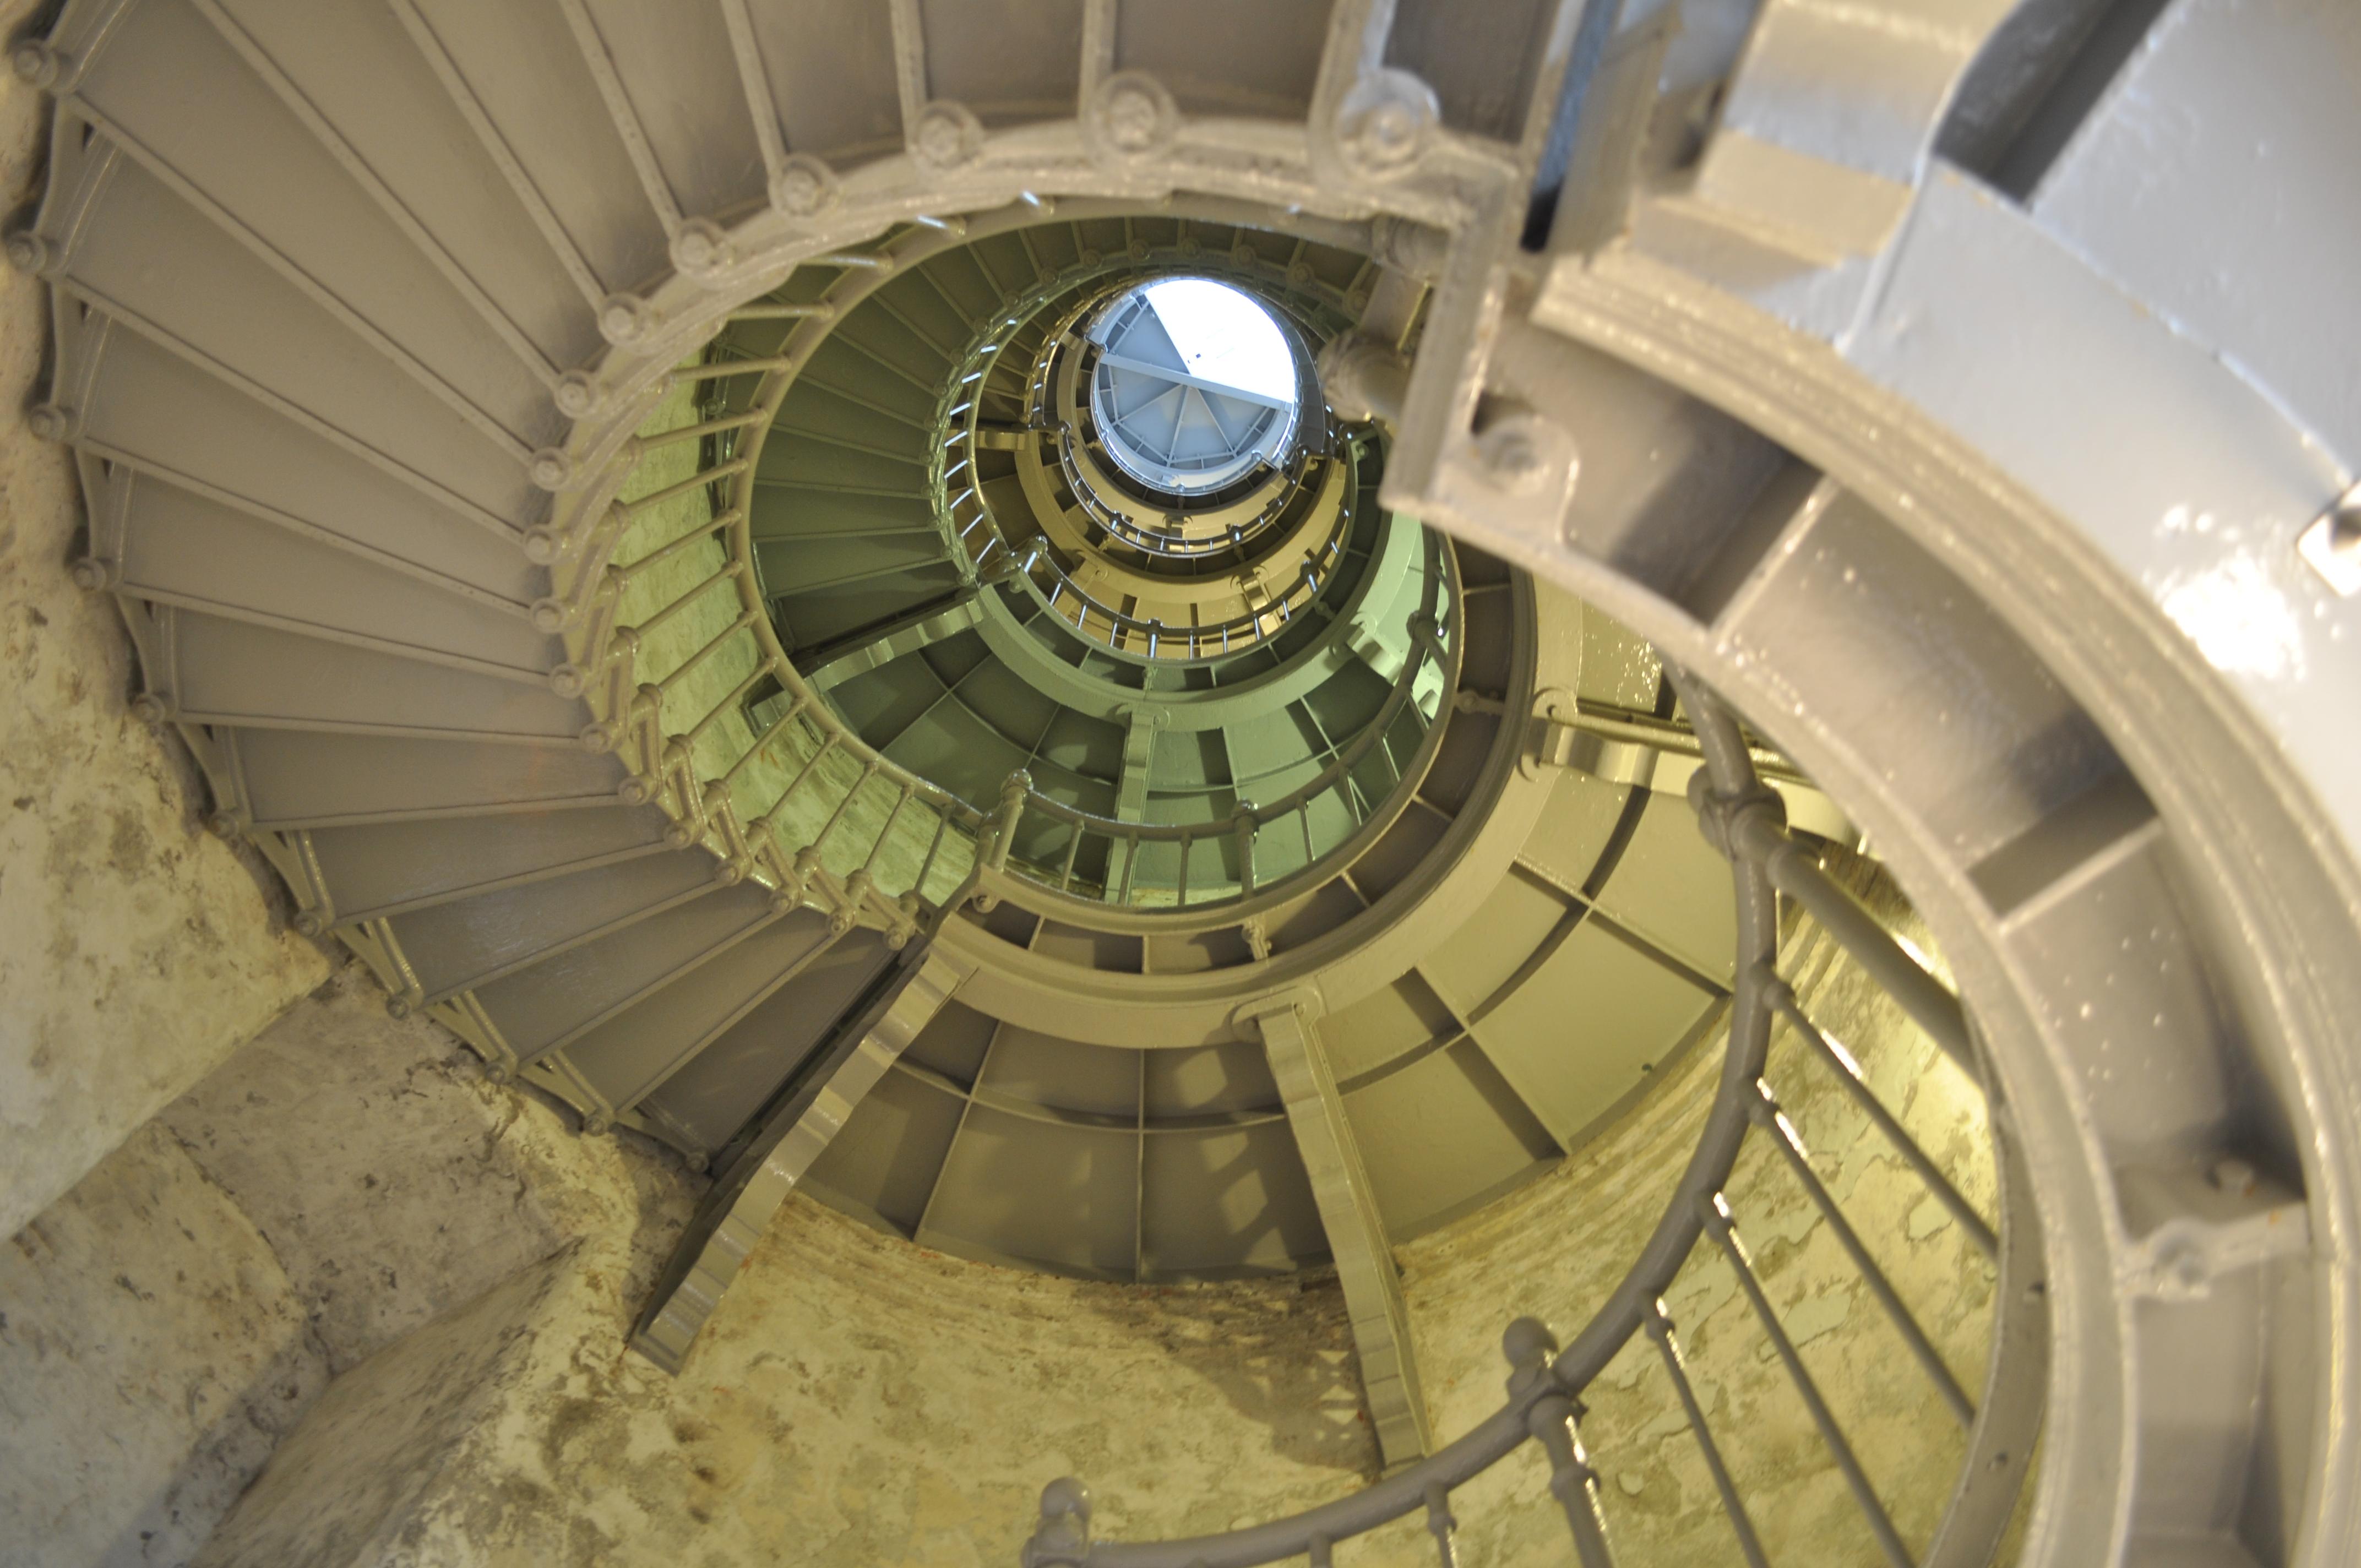 File:Grays Harbor (Westport) Lighthouse Interior 02